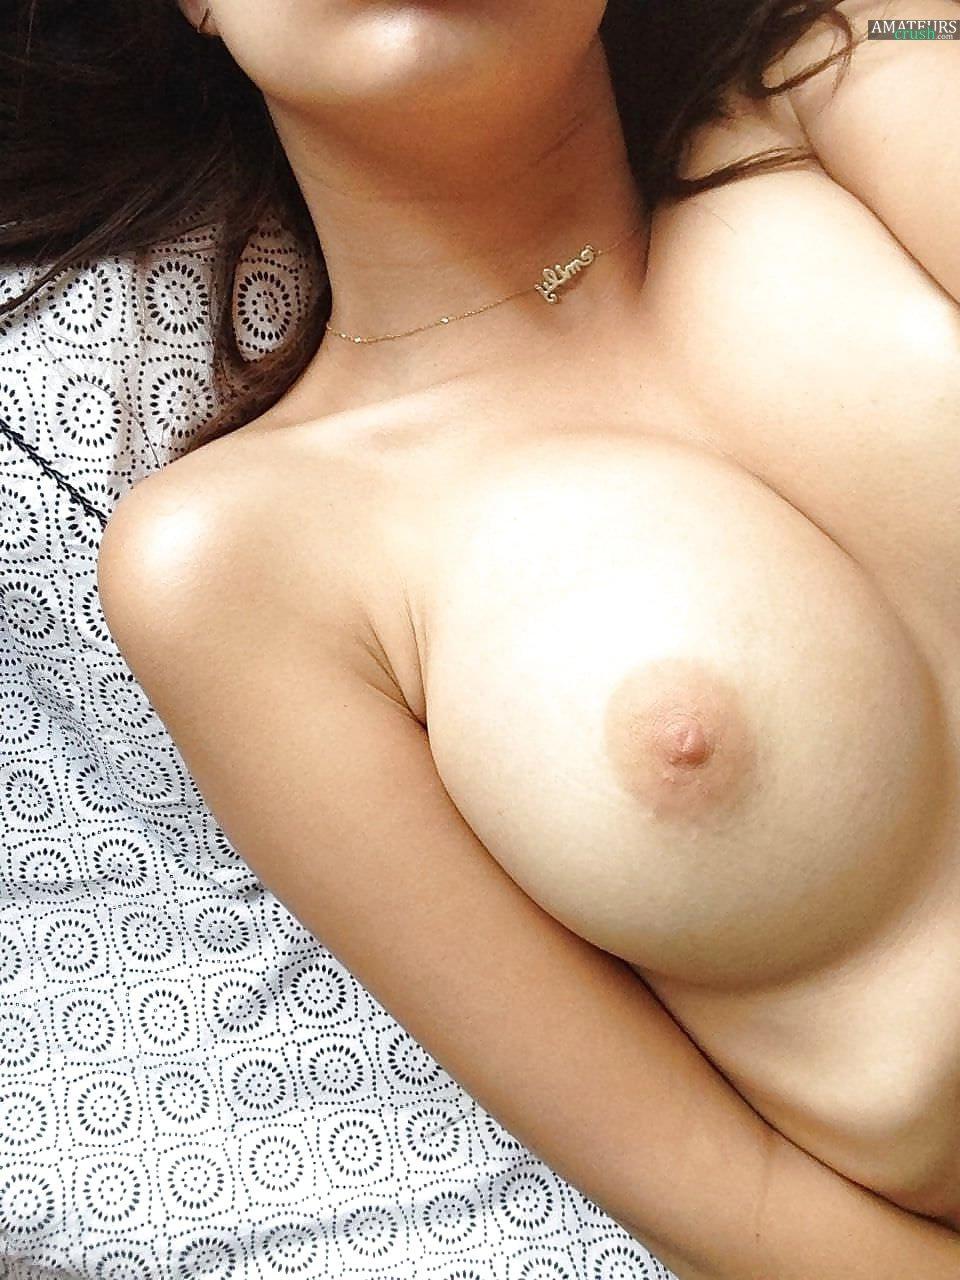 panties Sex Alyson Hannigan naked photo 2017